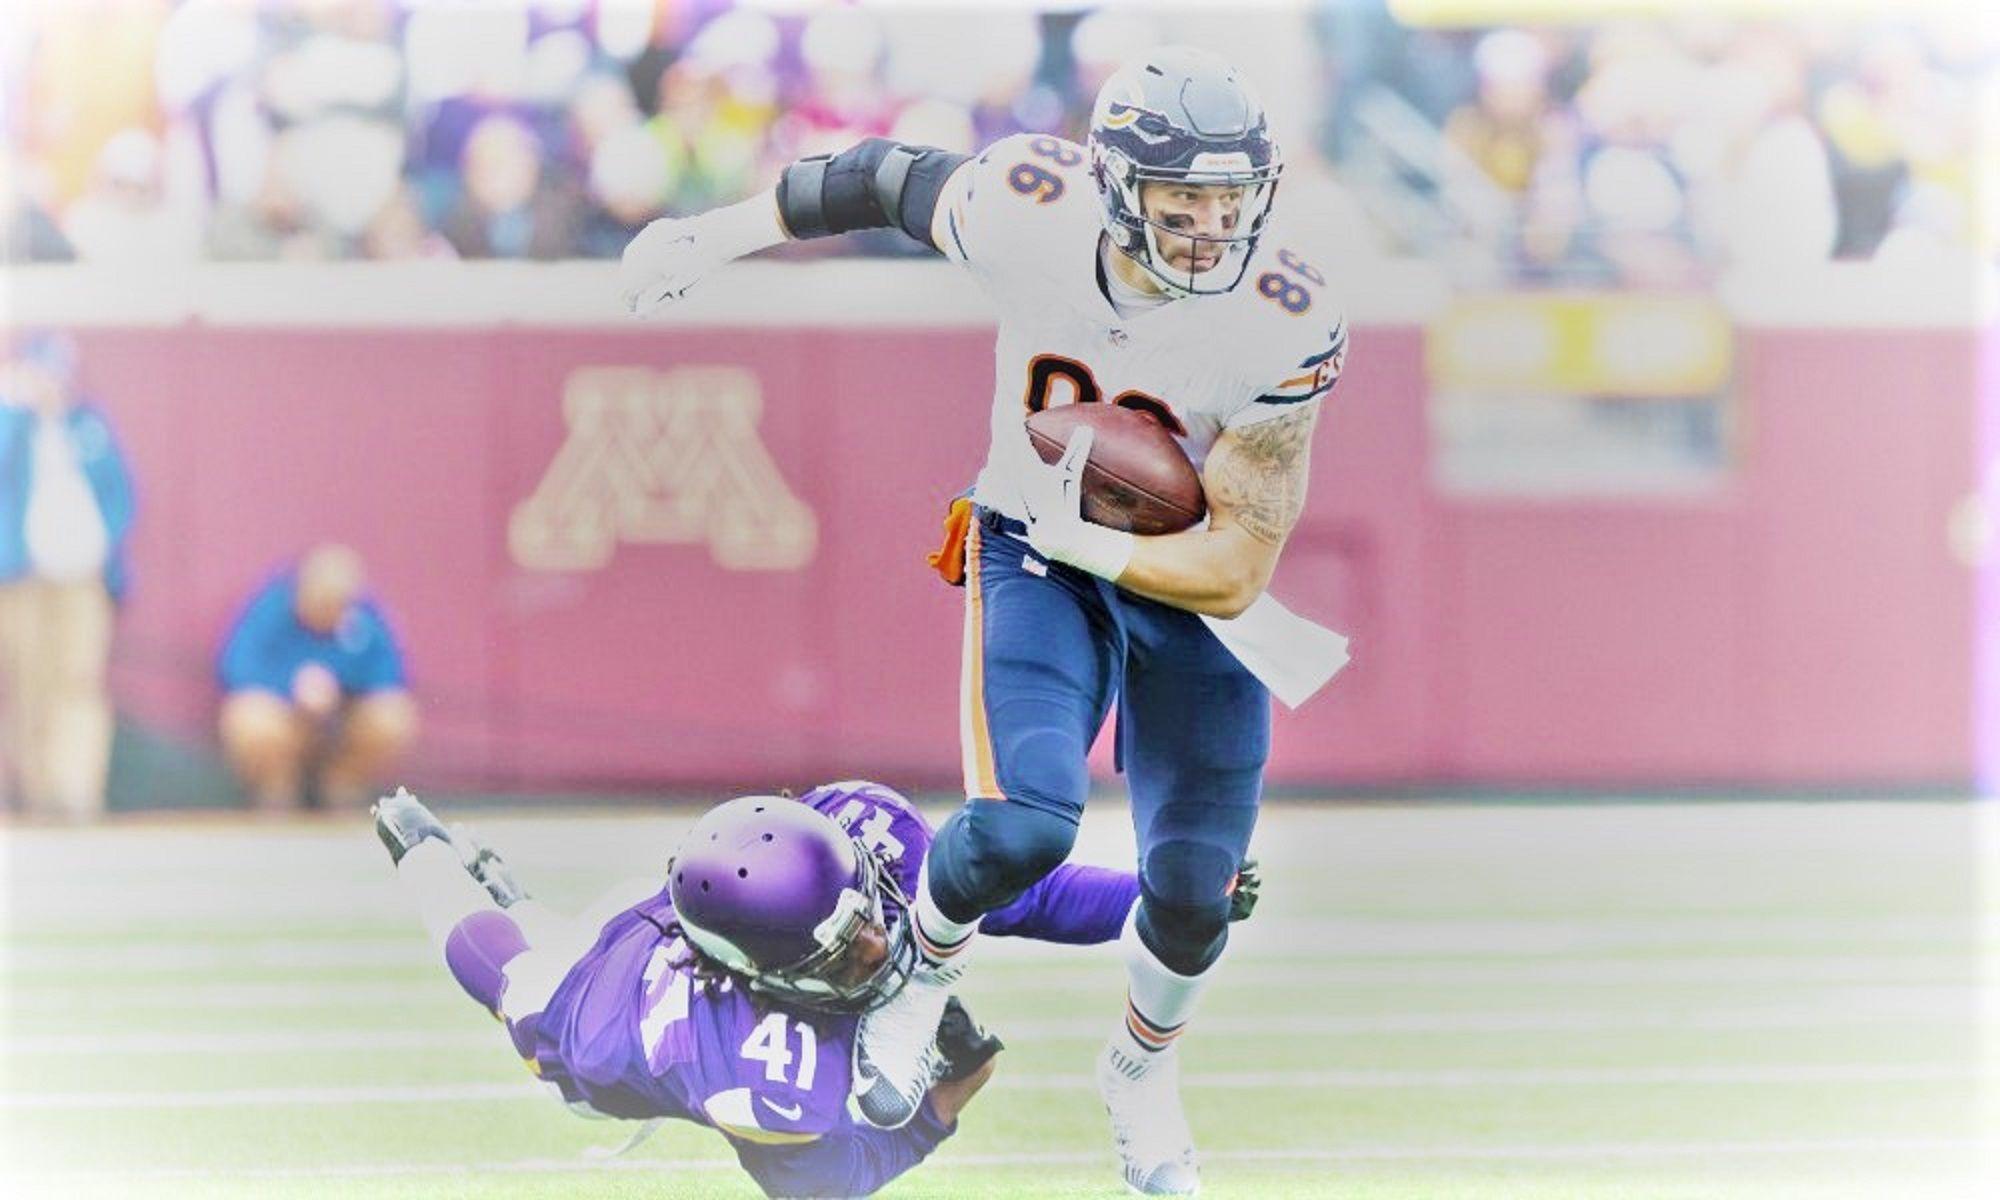 Minnesota Vikings Vs Chicago Bears Live Stream Free Watch Usa Football Online Game Week 11 Updates Schedule